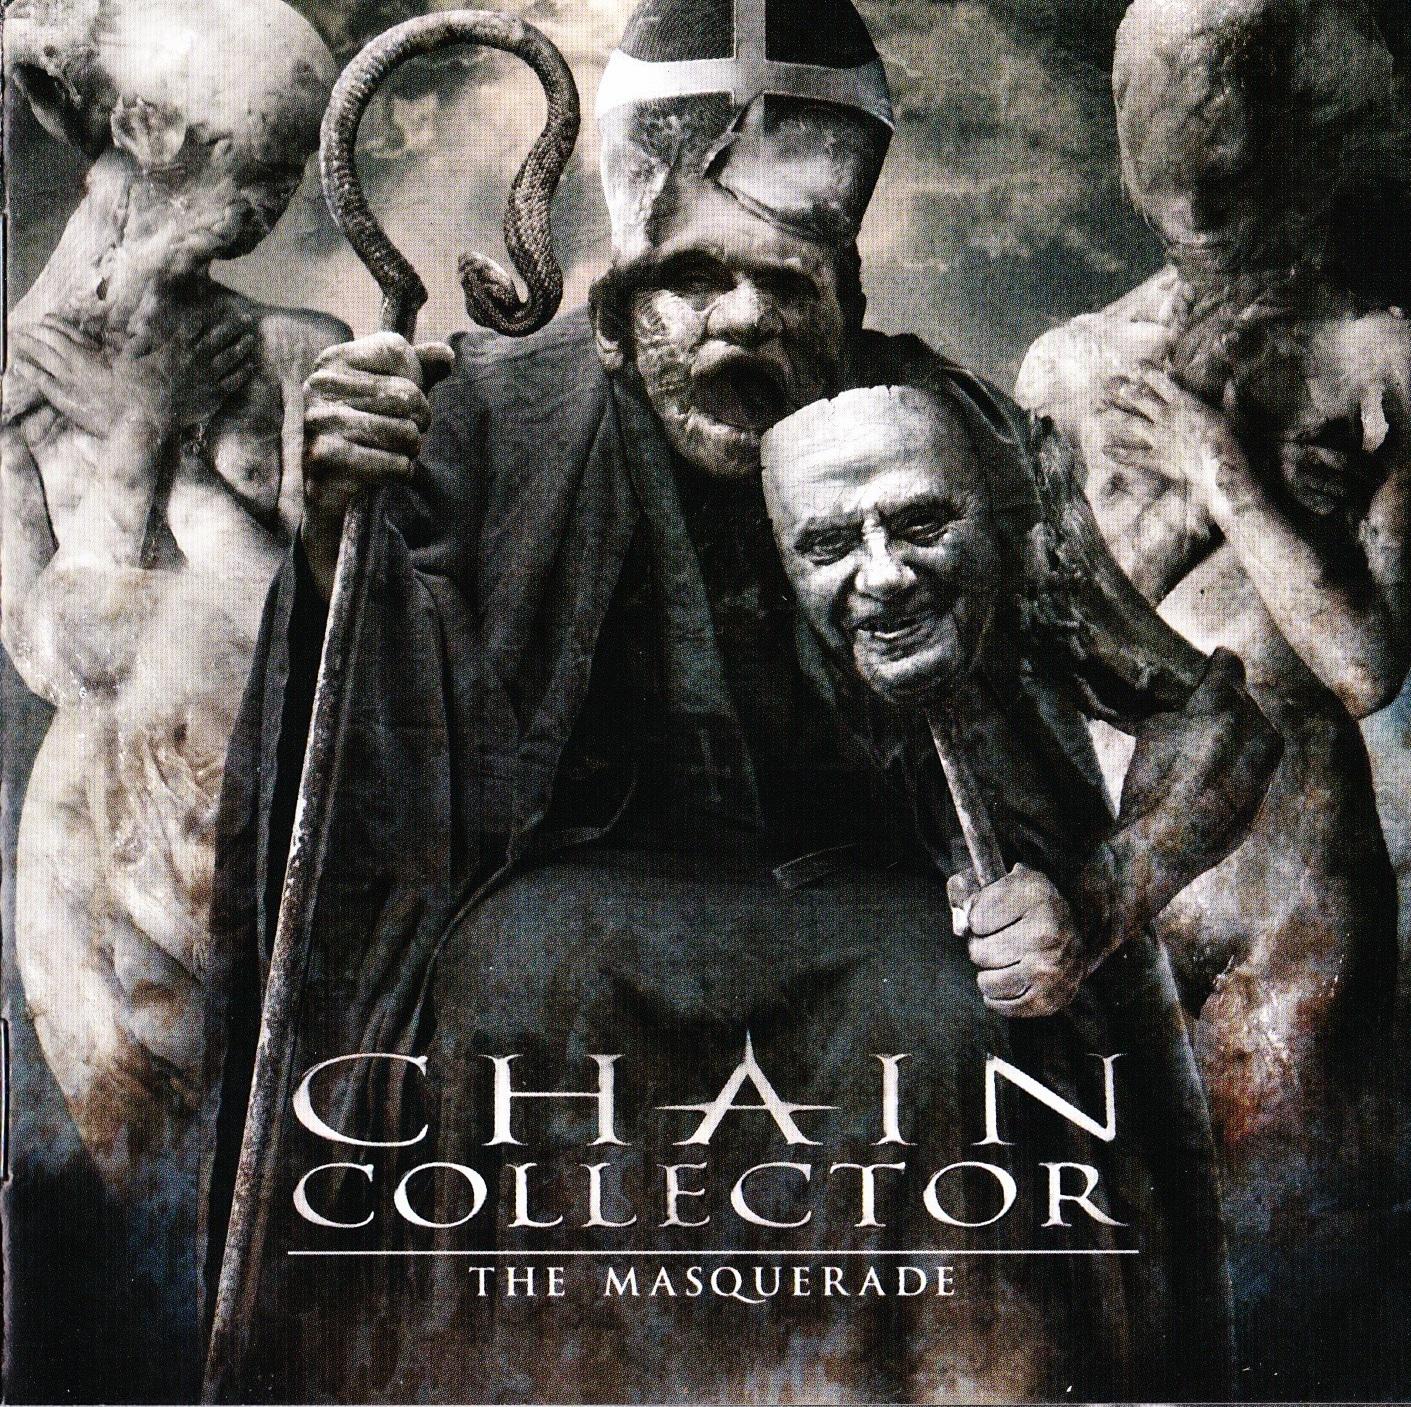 Chain Collector — The Masquerade (2005)